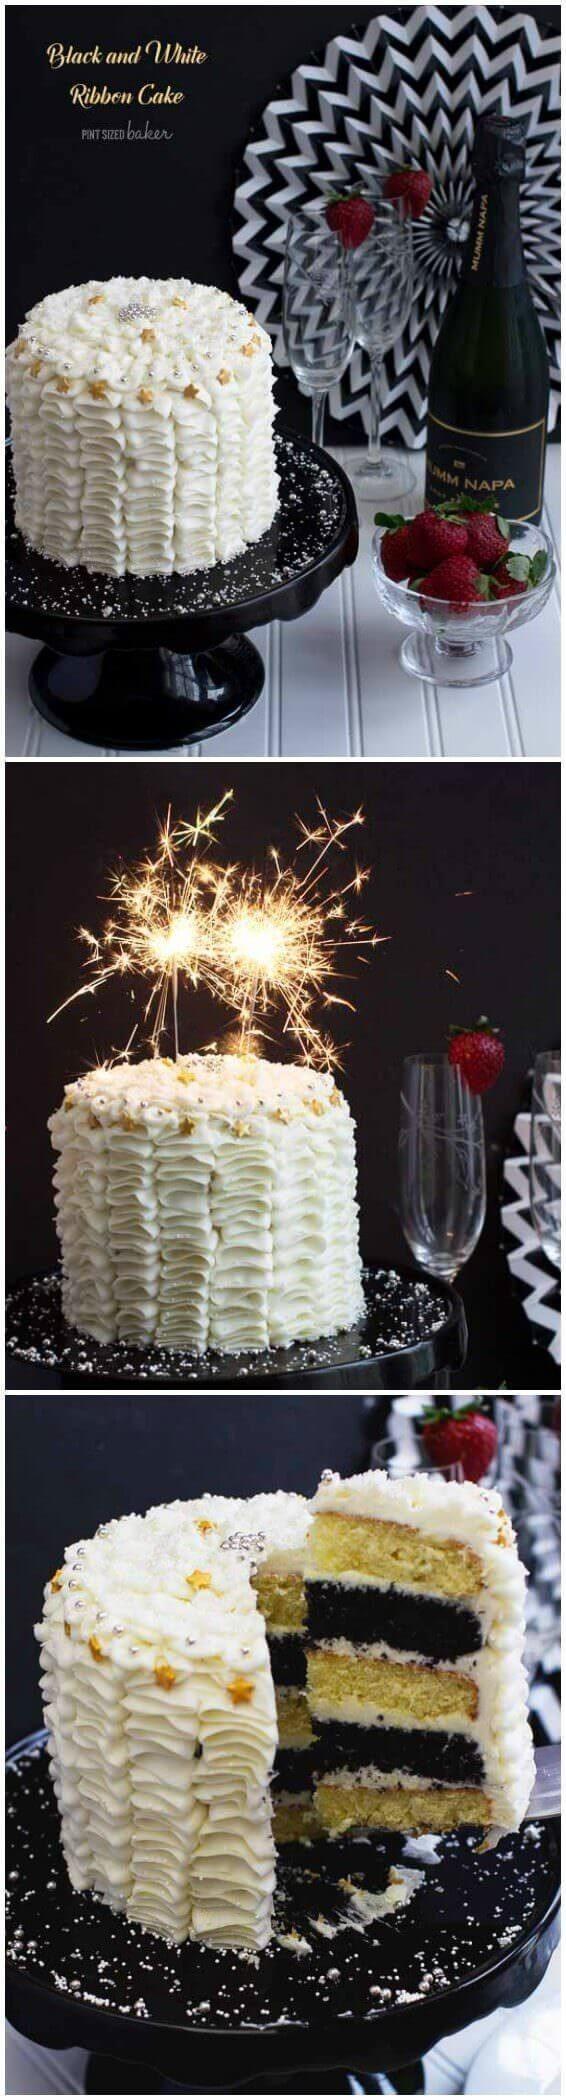 24+ Elegant Image of White And Black Birthday Cakes –  #birthday #black #cakes #elegant #imag… – Birthday Cake  Ideen